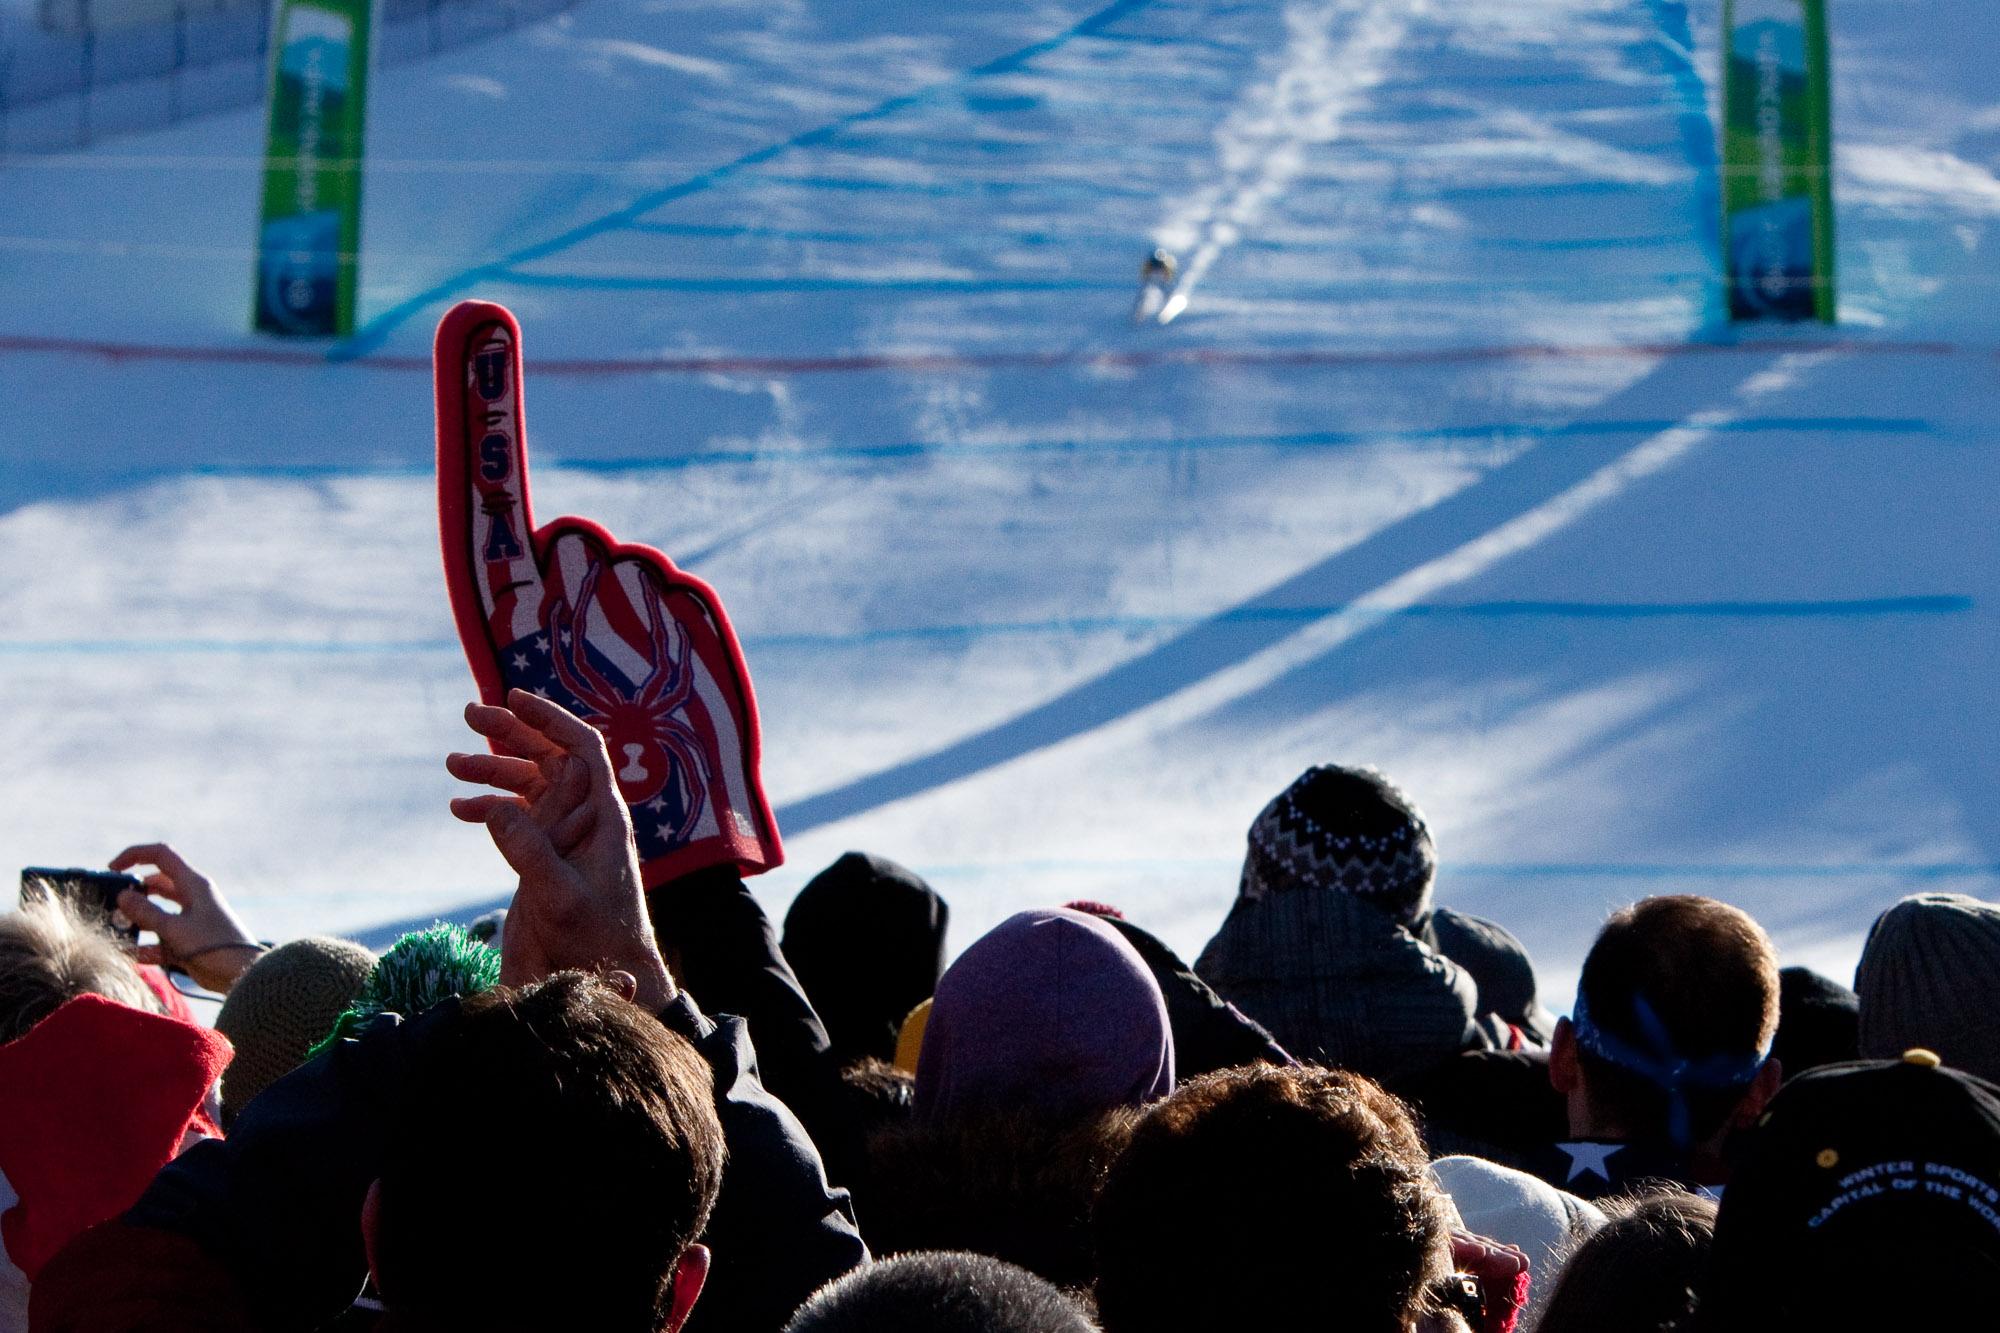 Justa-Jeskova-sport-events-photography-JJ006700.jpg